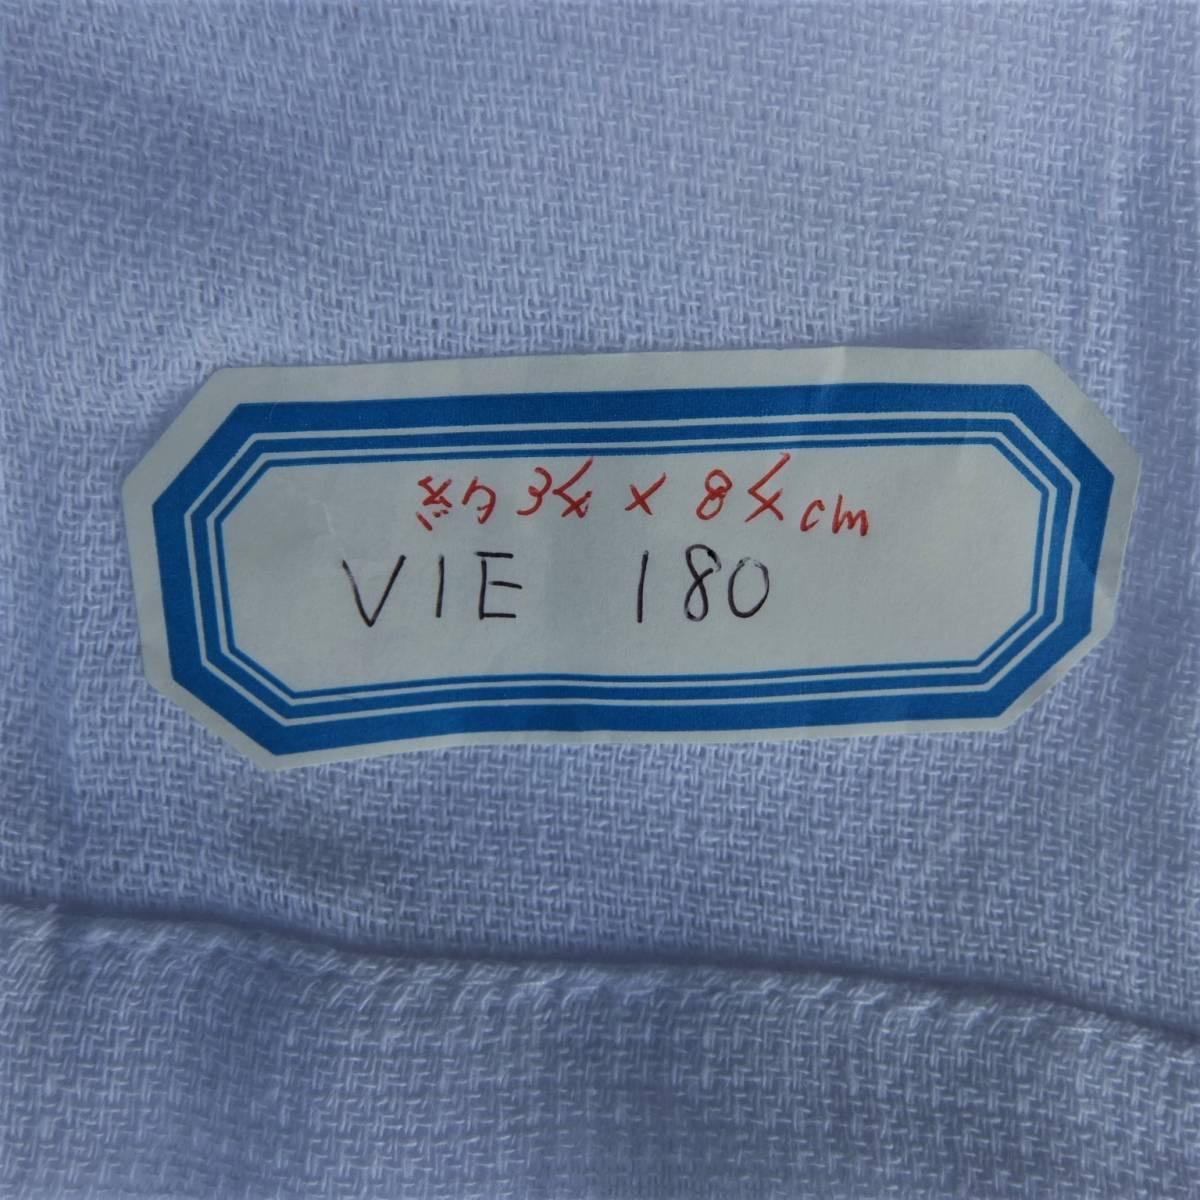 T-002A まとめて600枚 輸入品 白タオル フェイスタオル 180匁 VIE180 平地付 綿100% 格安 雑巾 介護 ウエス タオル 白 業務用 新品_画像4